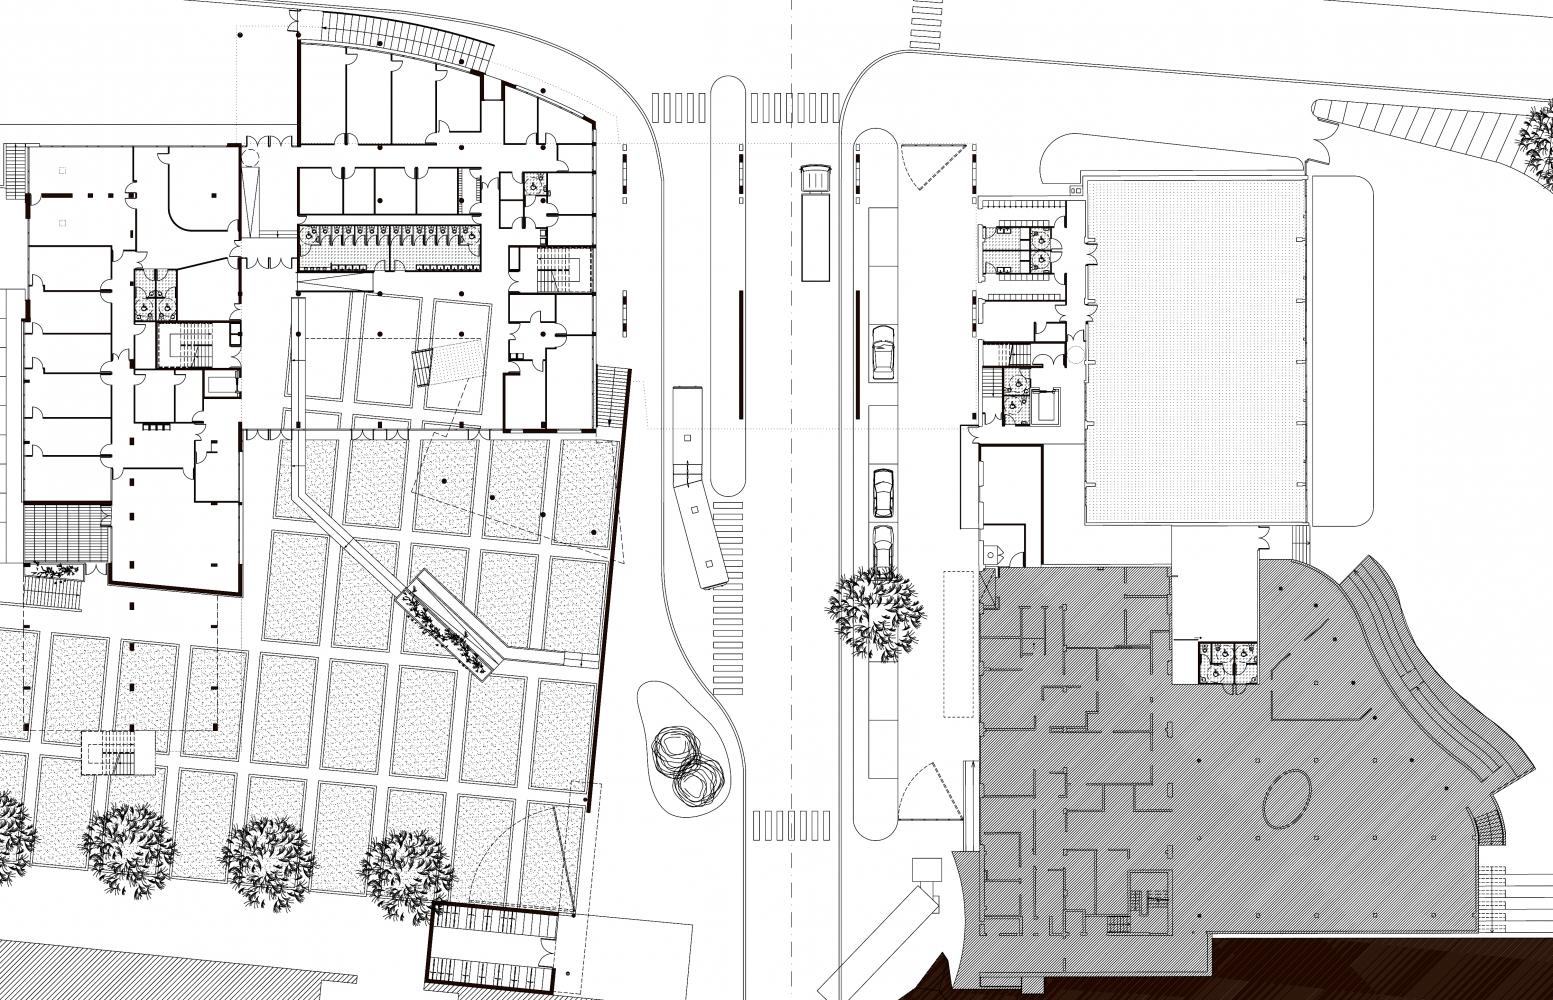 09-epernay-img-004 Pascale SEURIN Architecte - Pascale SEURIN Architecte